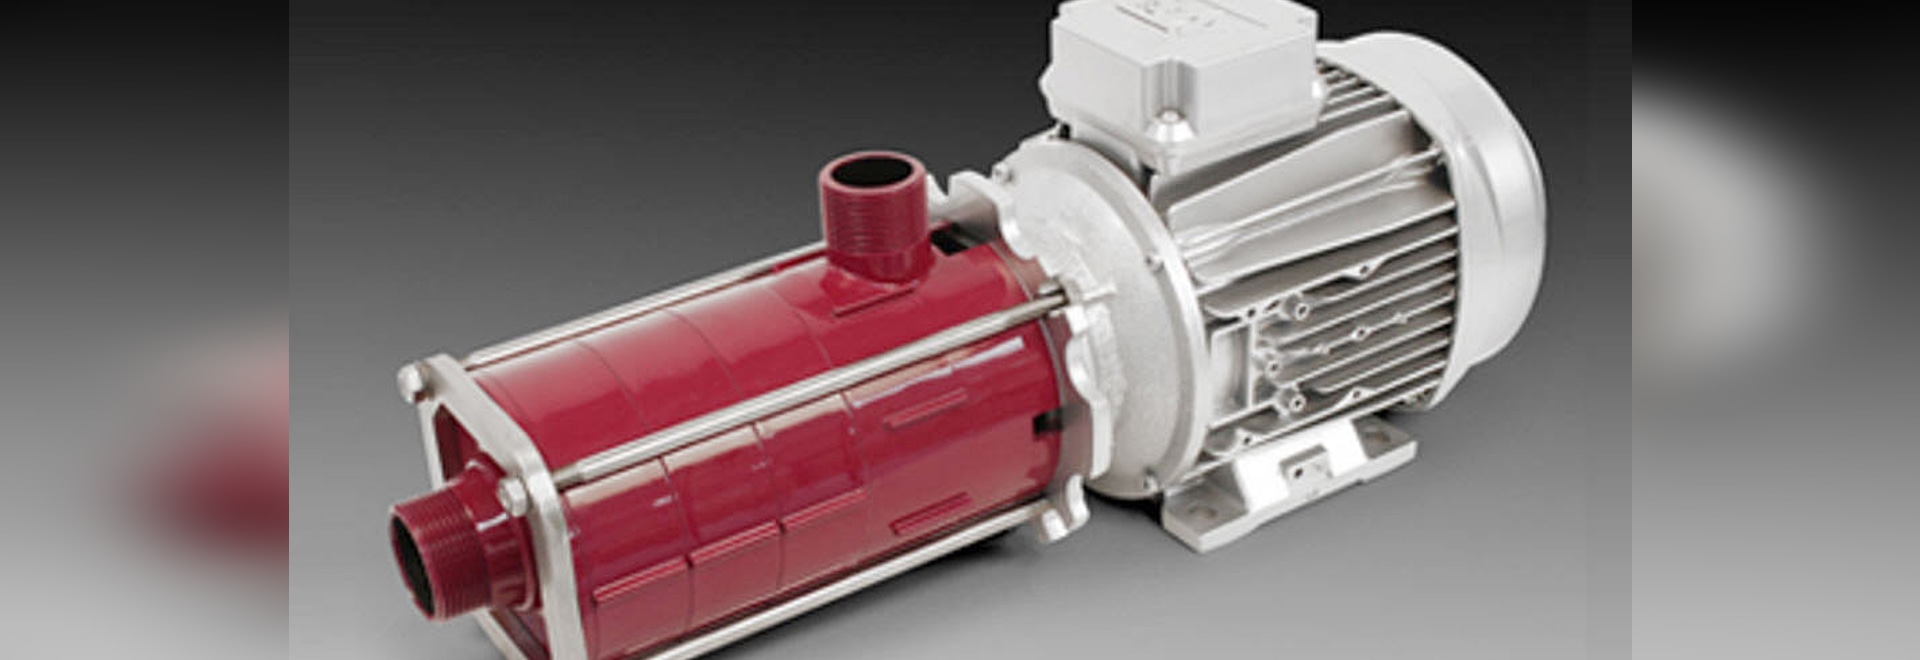 Multistage self-priming centrifugal pump type KSP